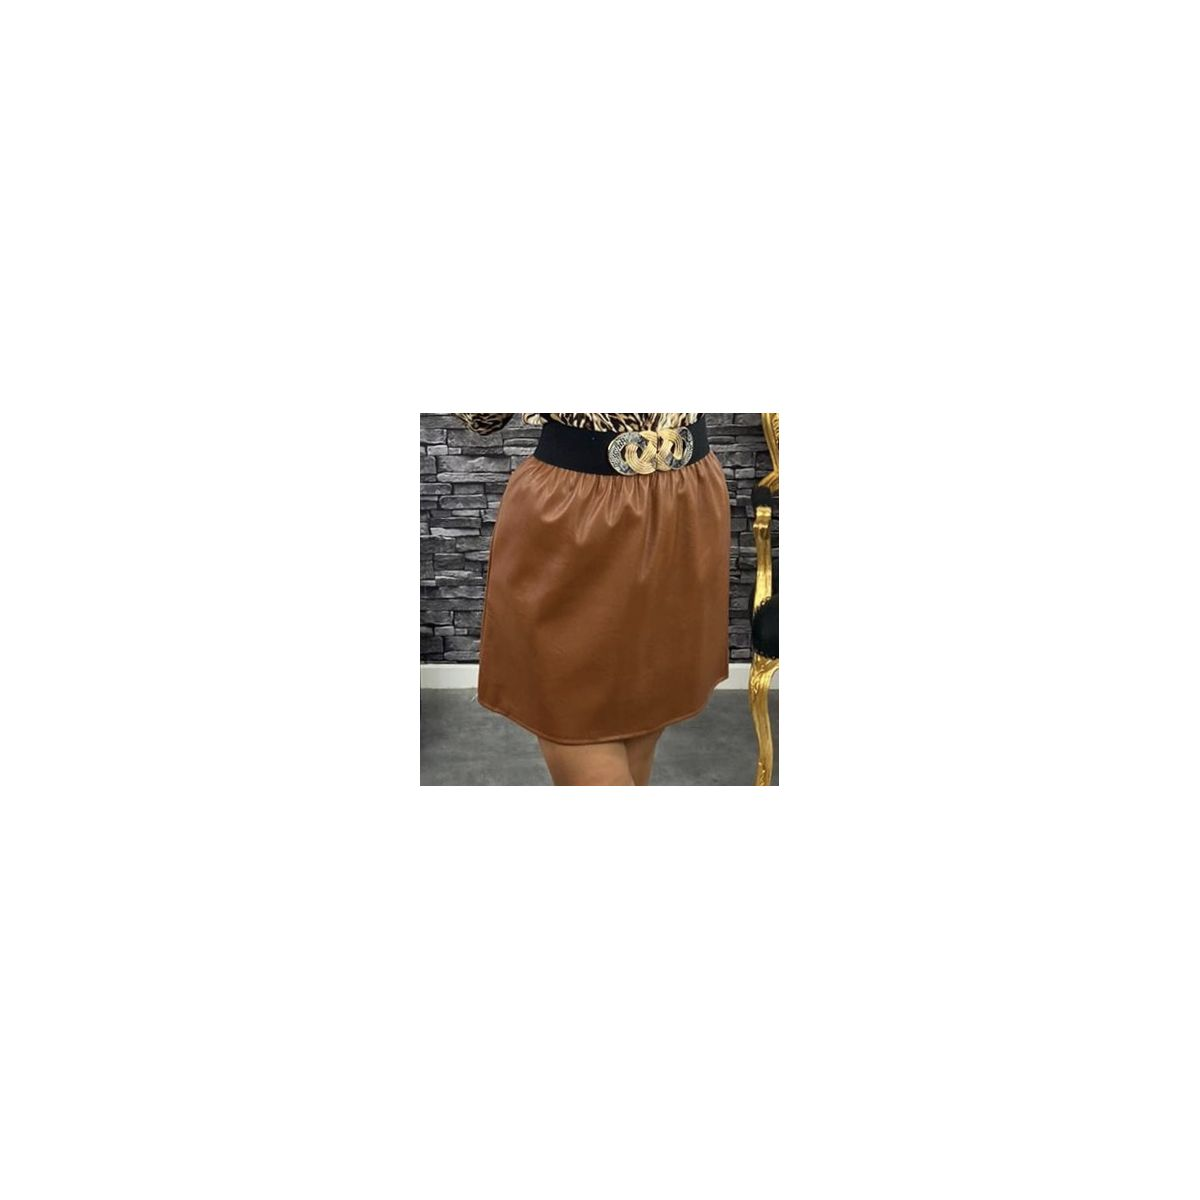 Jupe courte simili-cuir marron